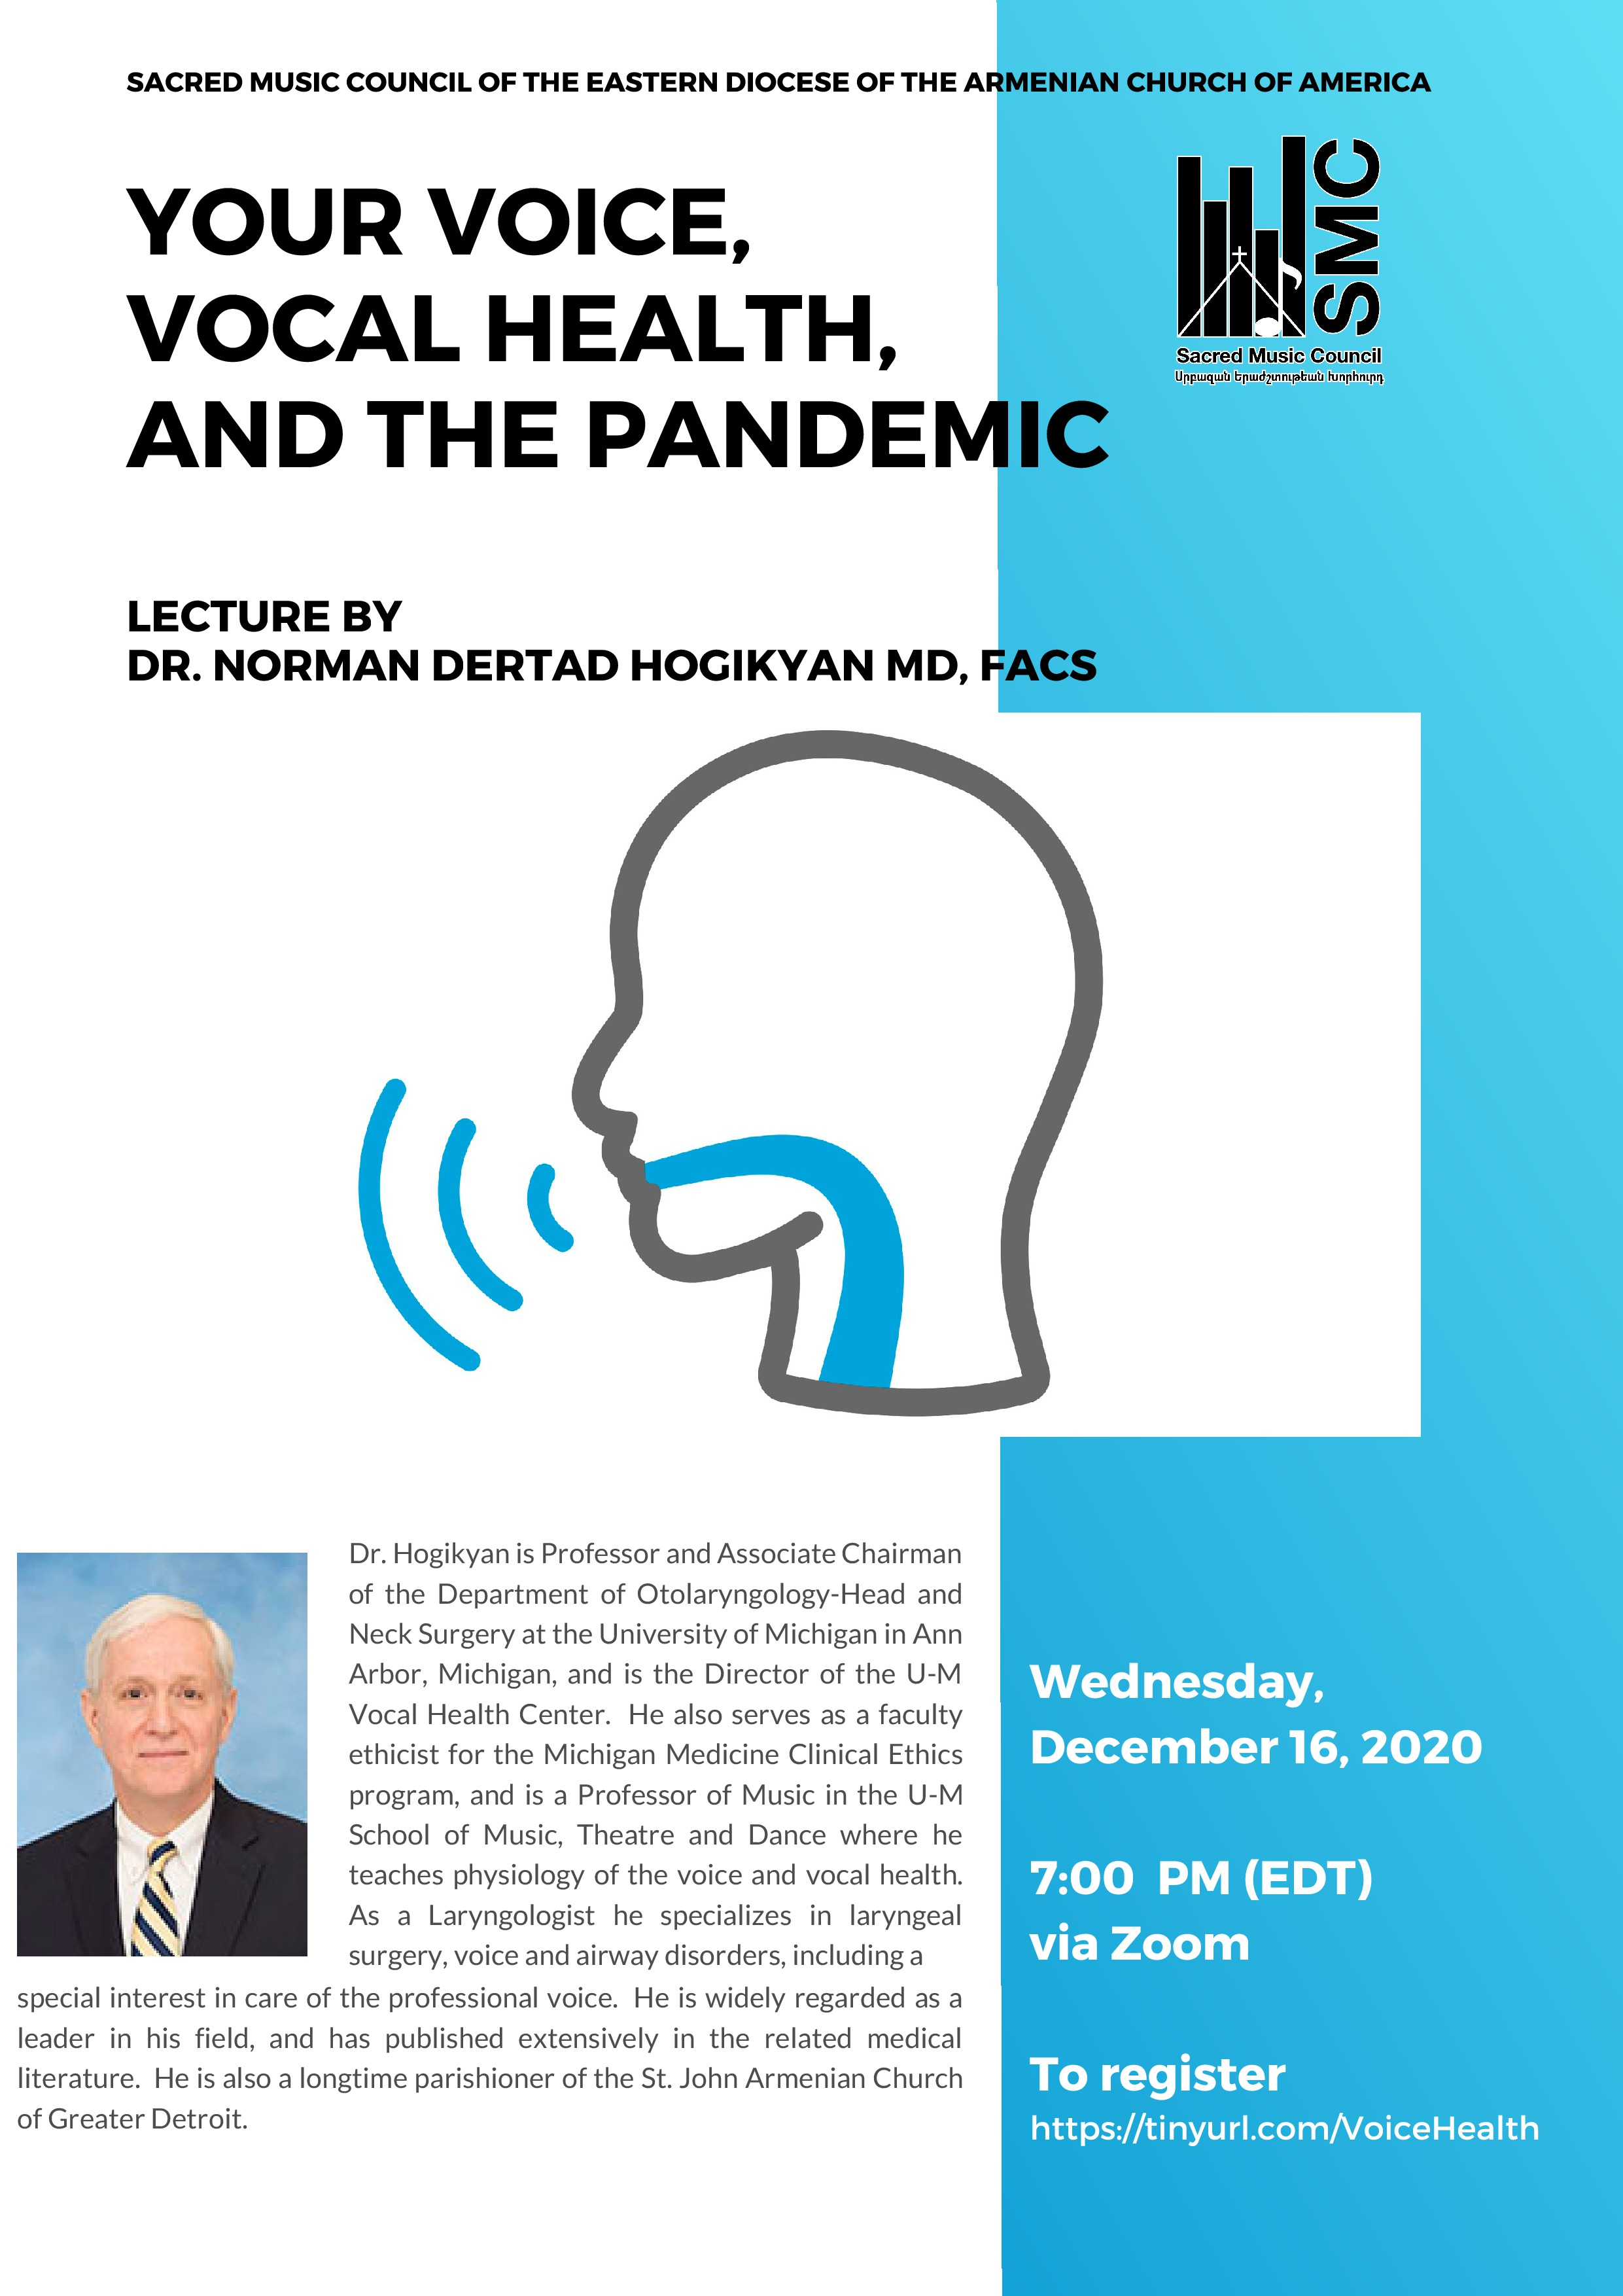 Voice Health Lecture